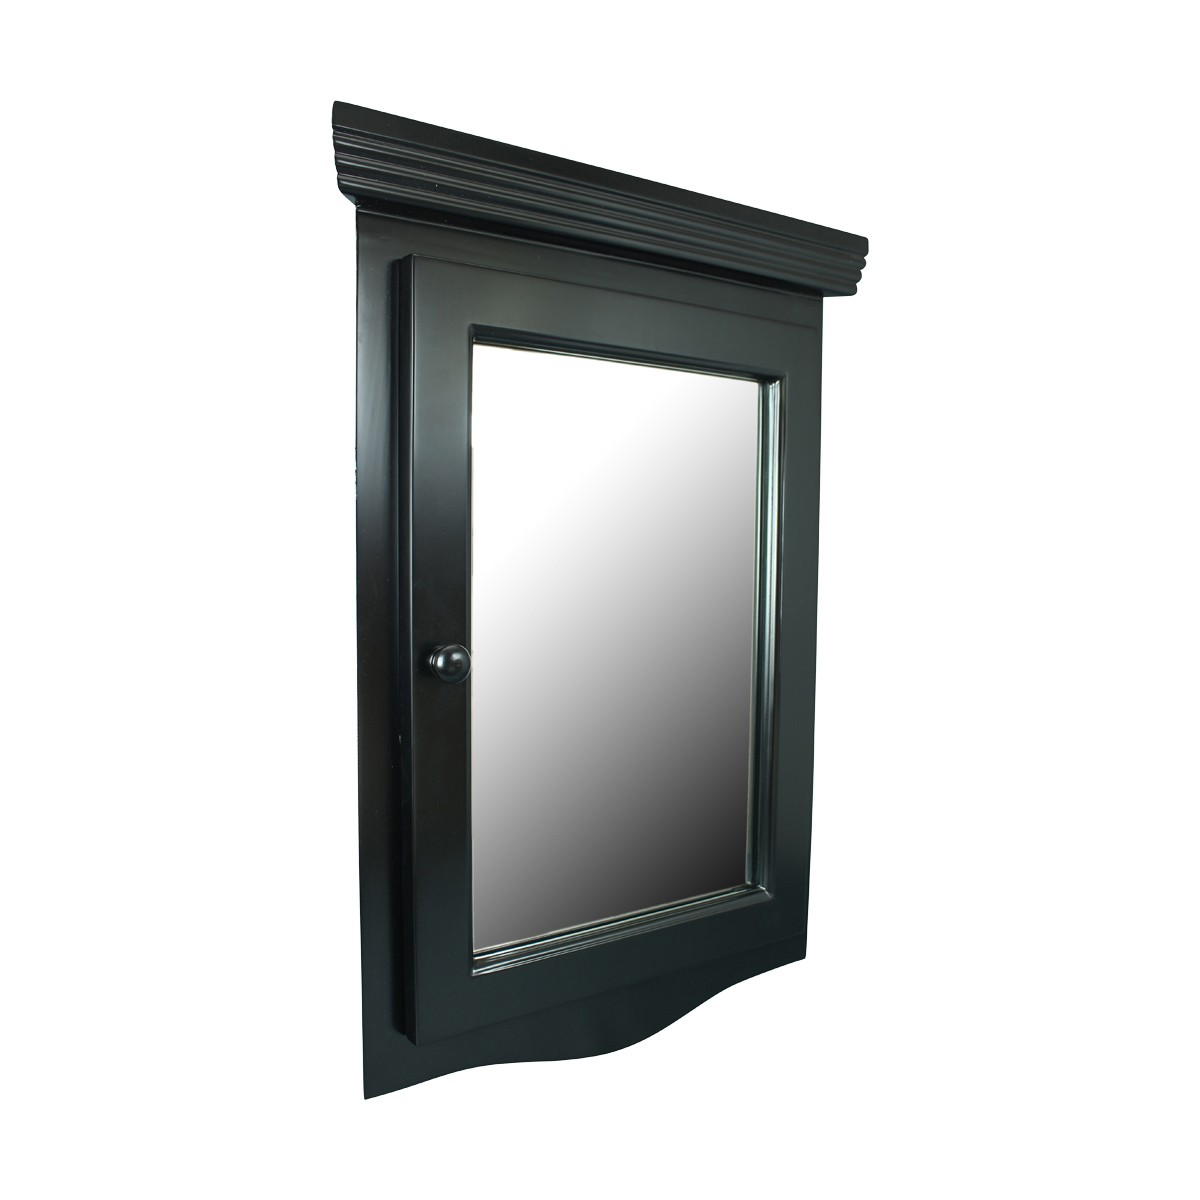 Black Solid Wood Bathroom Corner Medicine Cabinet Recessed Mirror Mirrored Medicine Cabinet Medicine Cabinet Organizer Medicine Cabinet Shelf